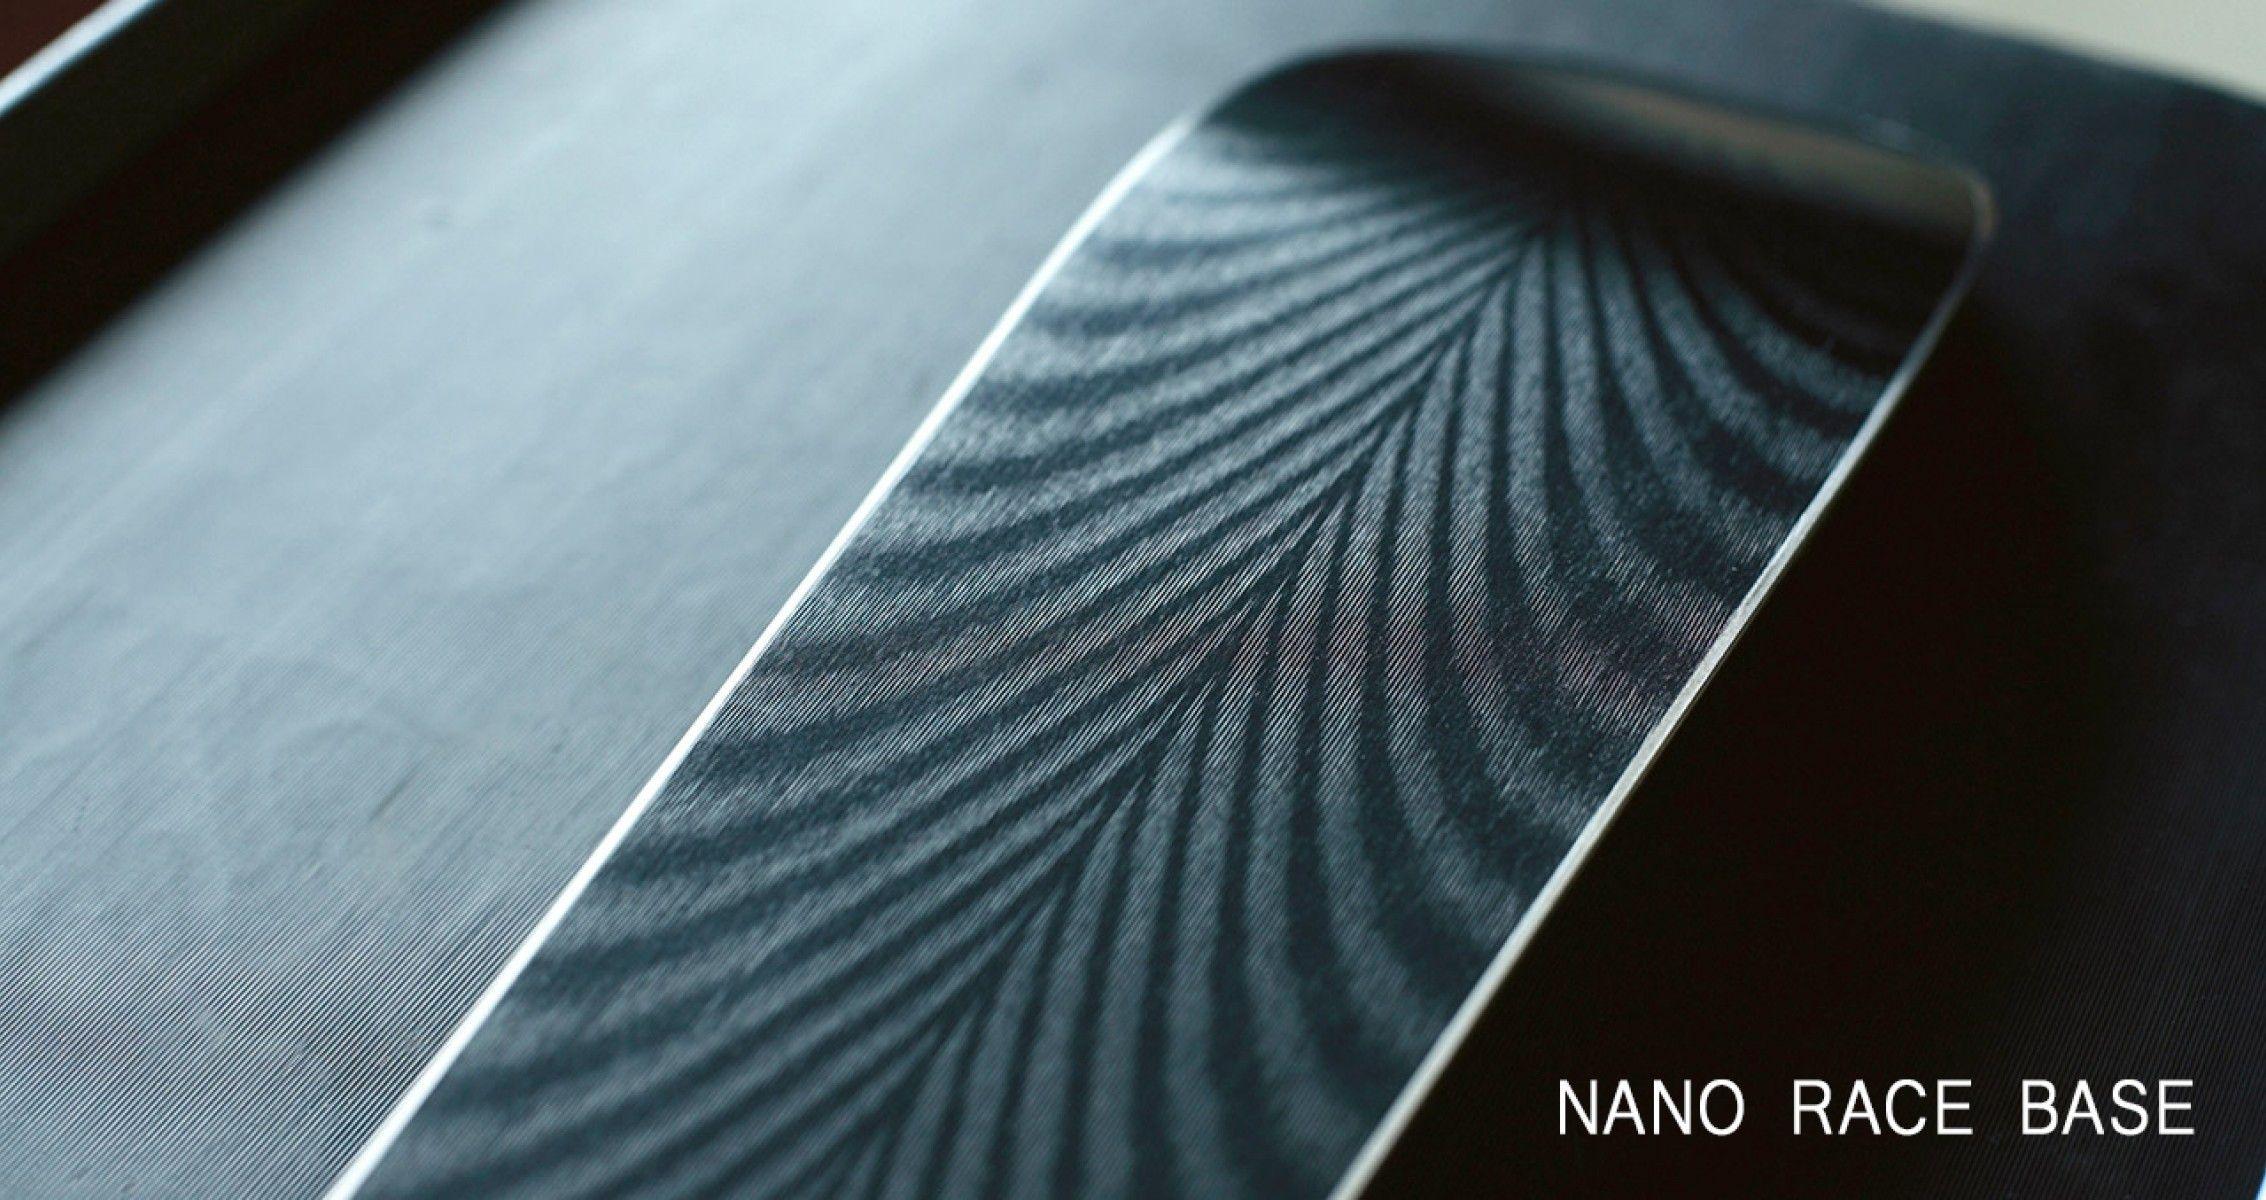 Nano Race Base Nano High Speed Race Coating Ski Franco By Zai Zaiski Sport Luxuryski Luxurysport Handmade H Snowboard Design Skiing World Cup Skiing